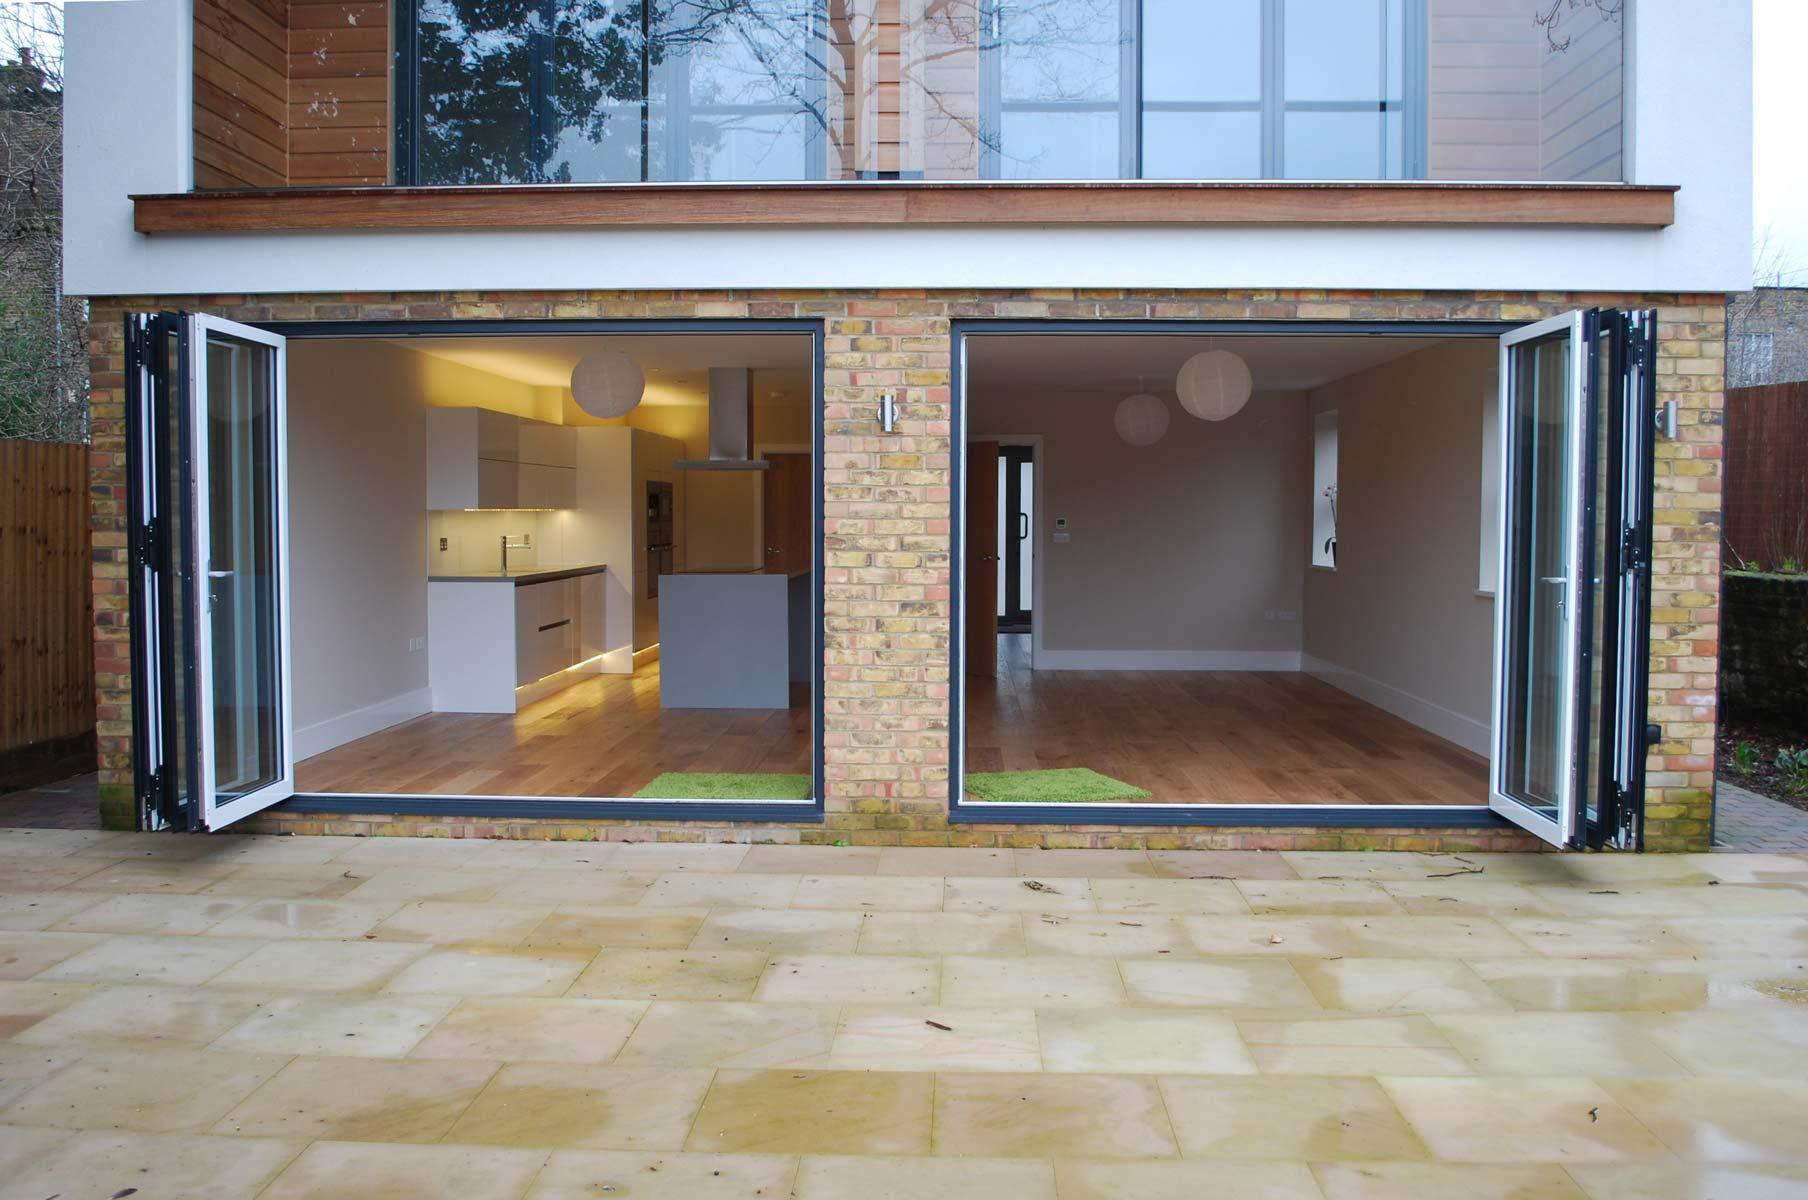 Bi Folding Doors With Lead Door Function From Southern Windows